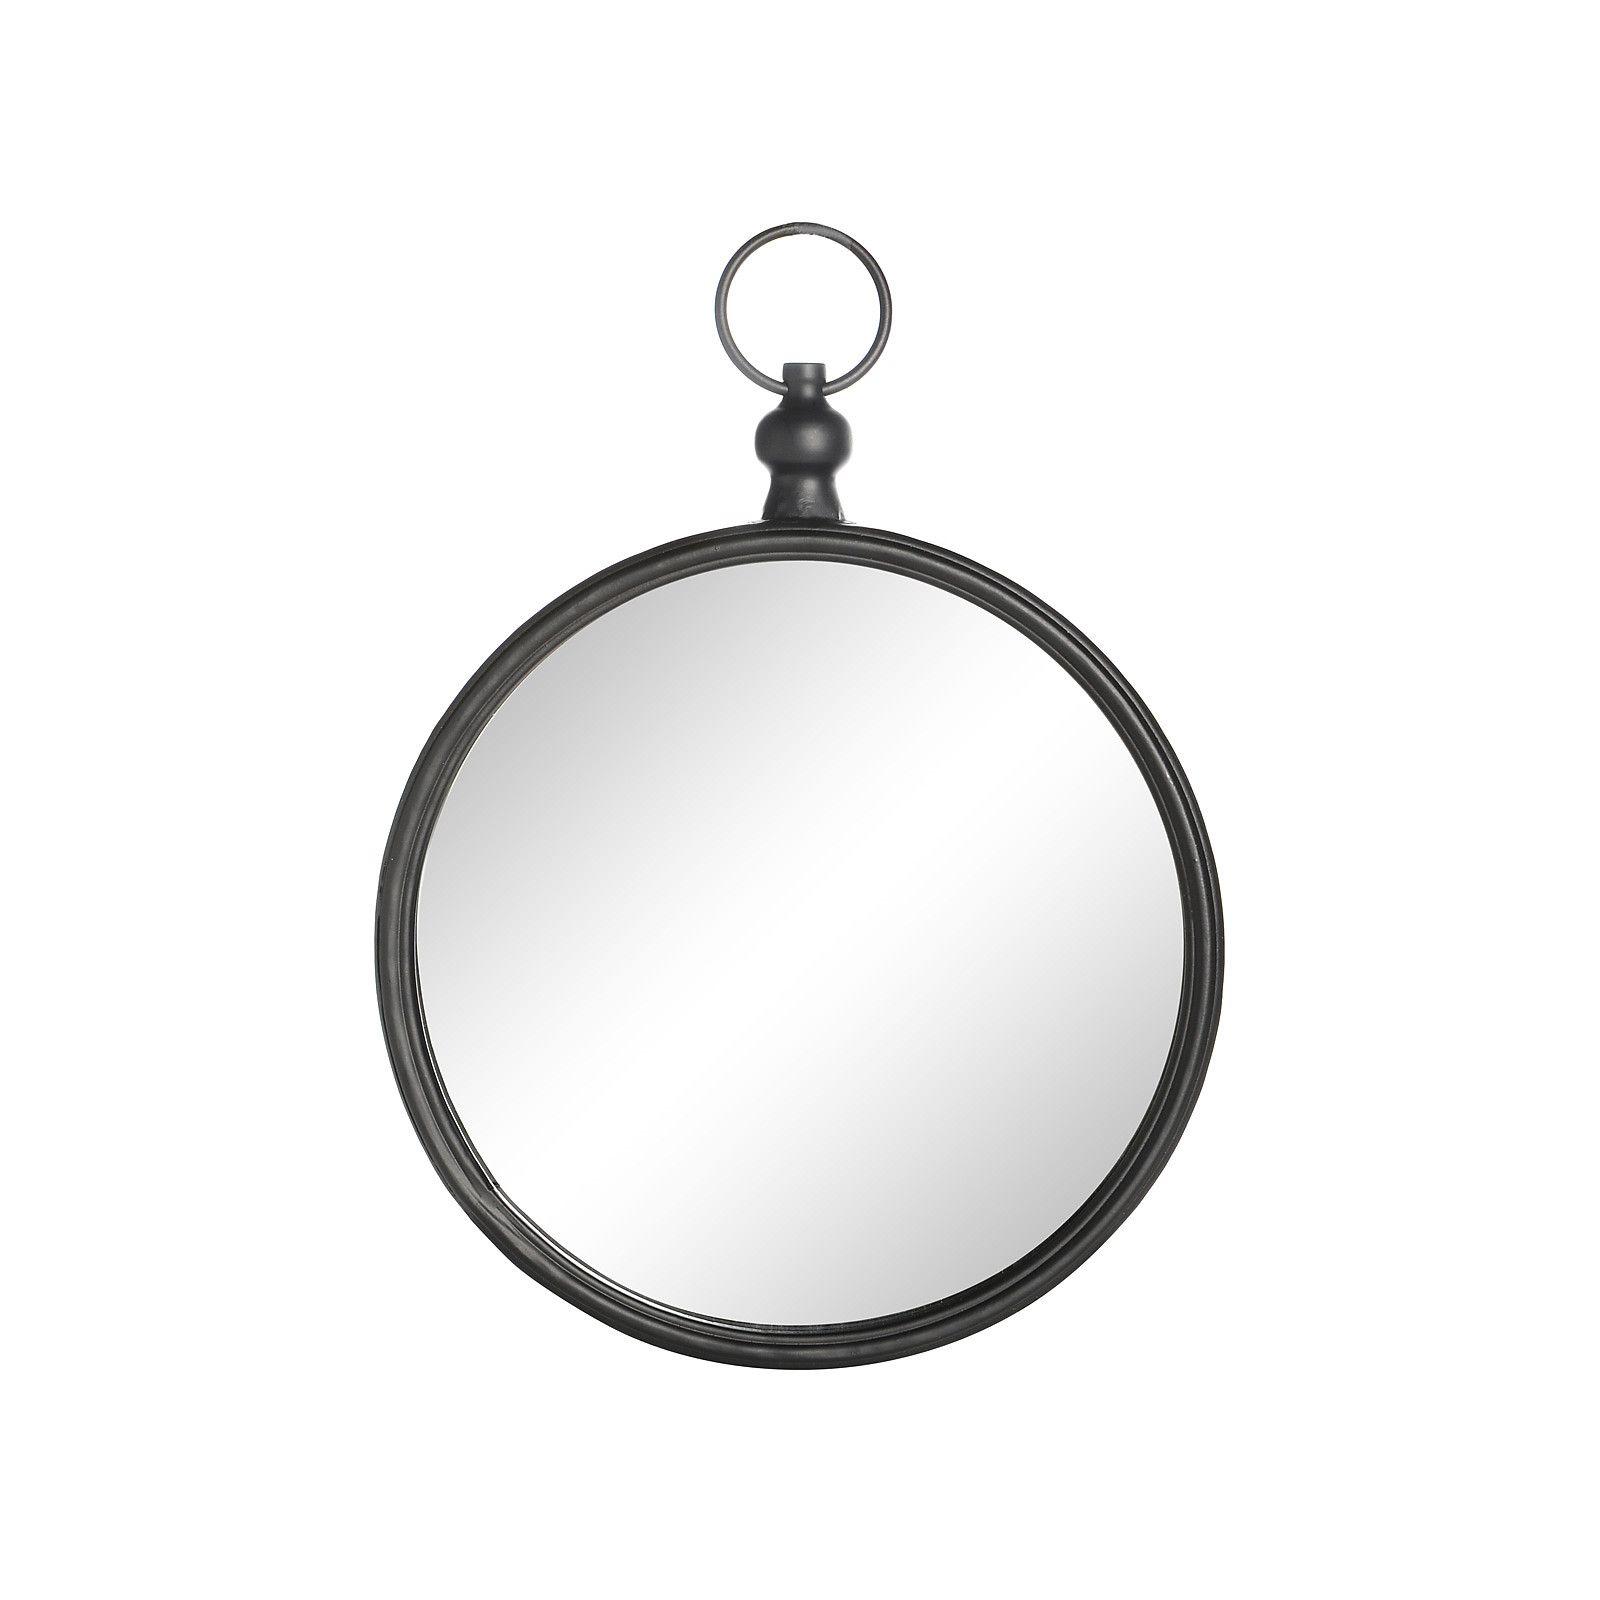 Epic Wanddeko Spiegel Metall schwarz ca D cm